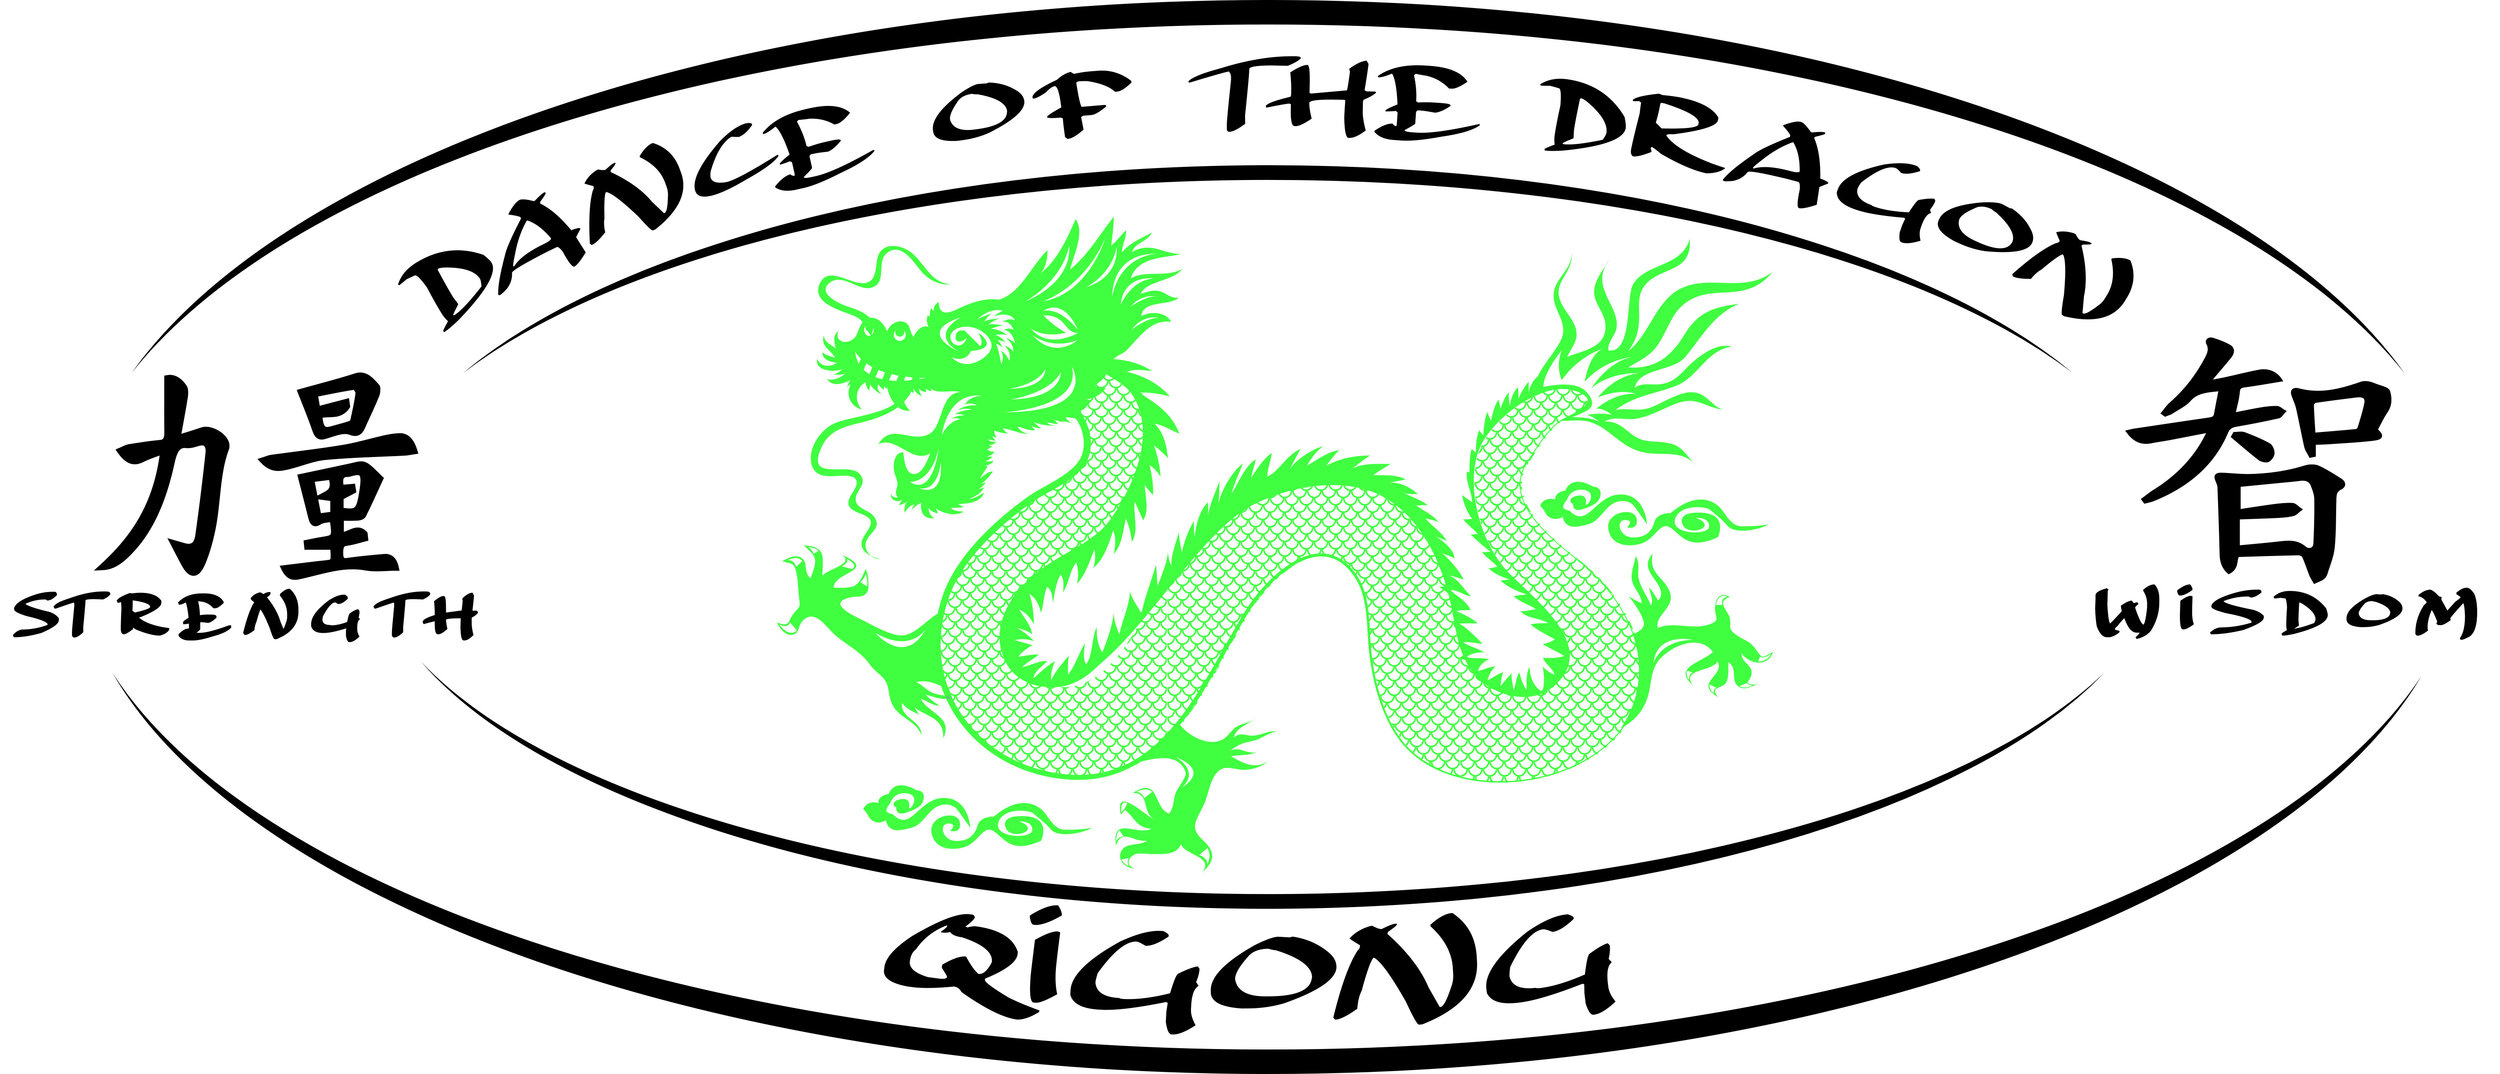 Dance of the Dragon Story — Dance of the Dragon Qigong